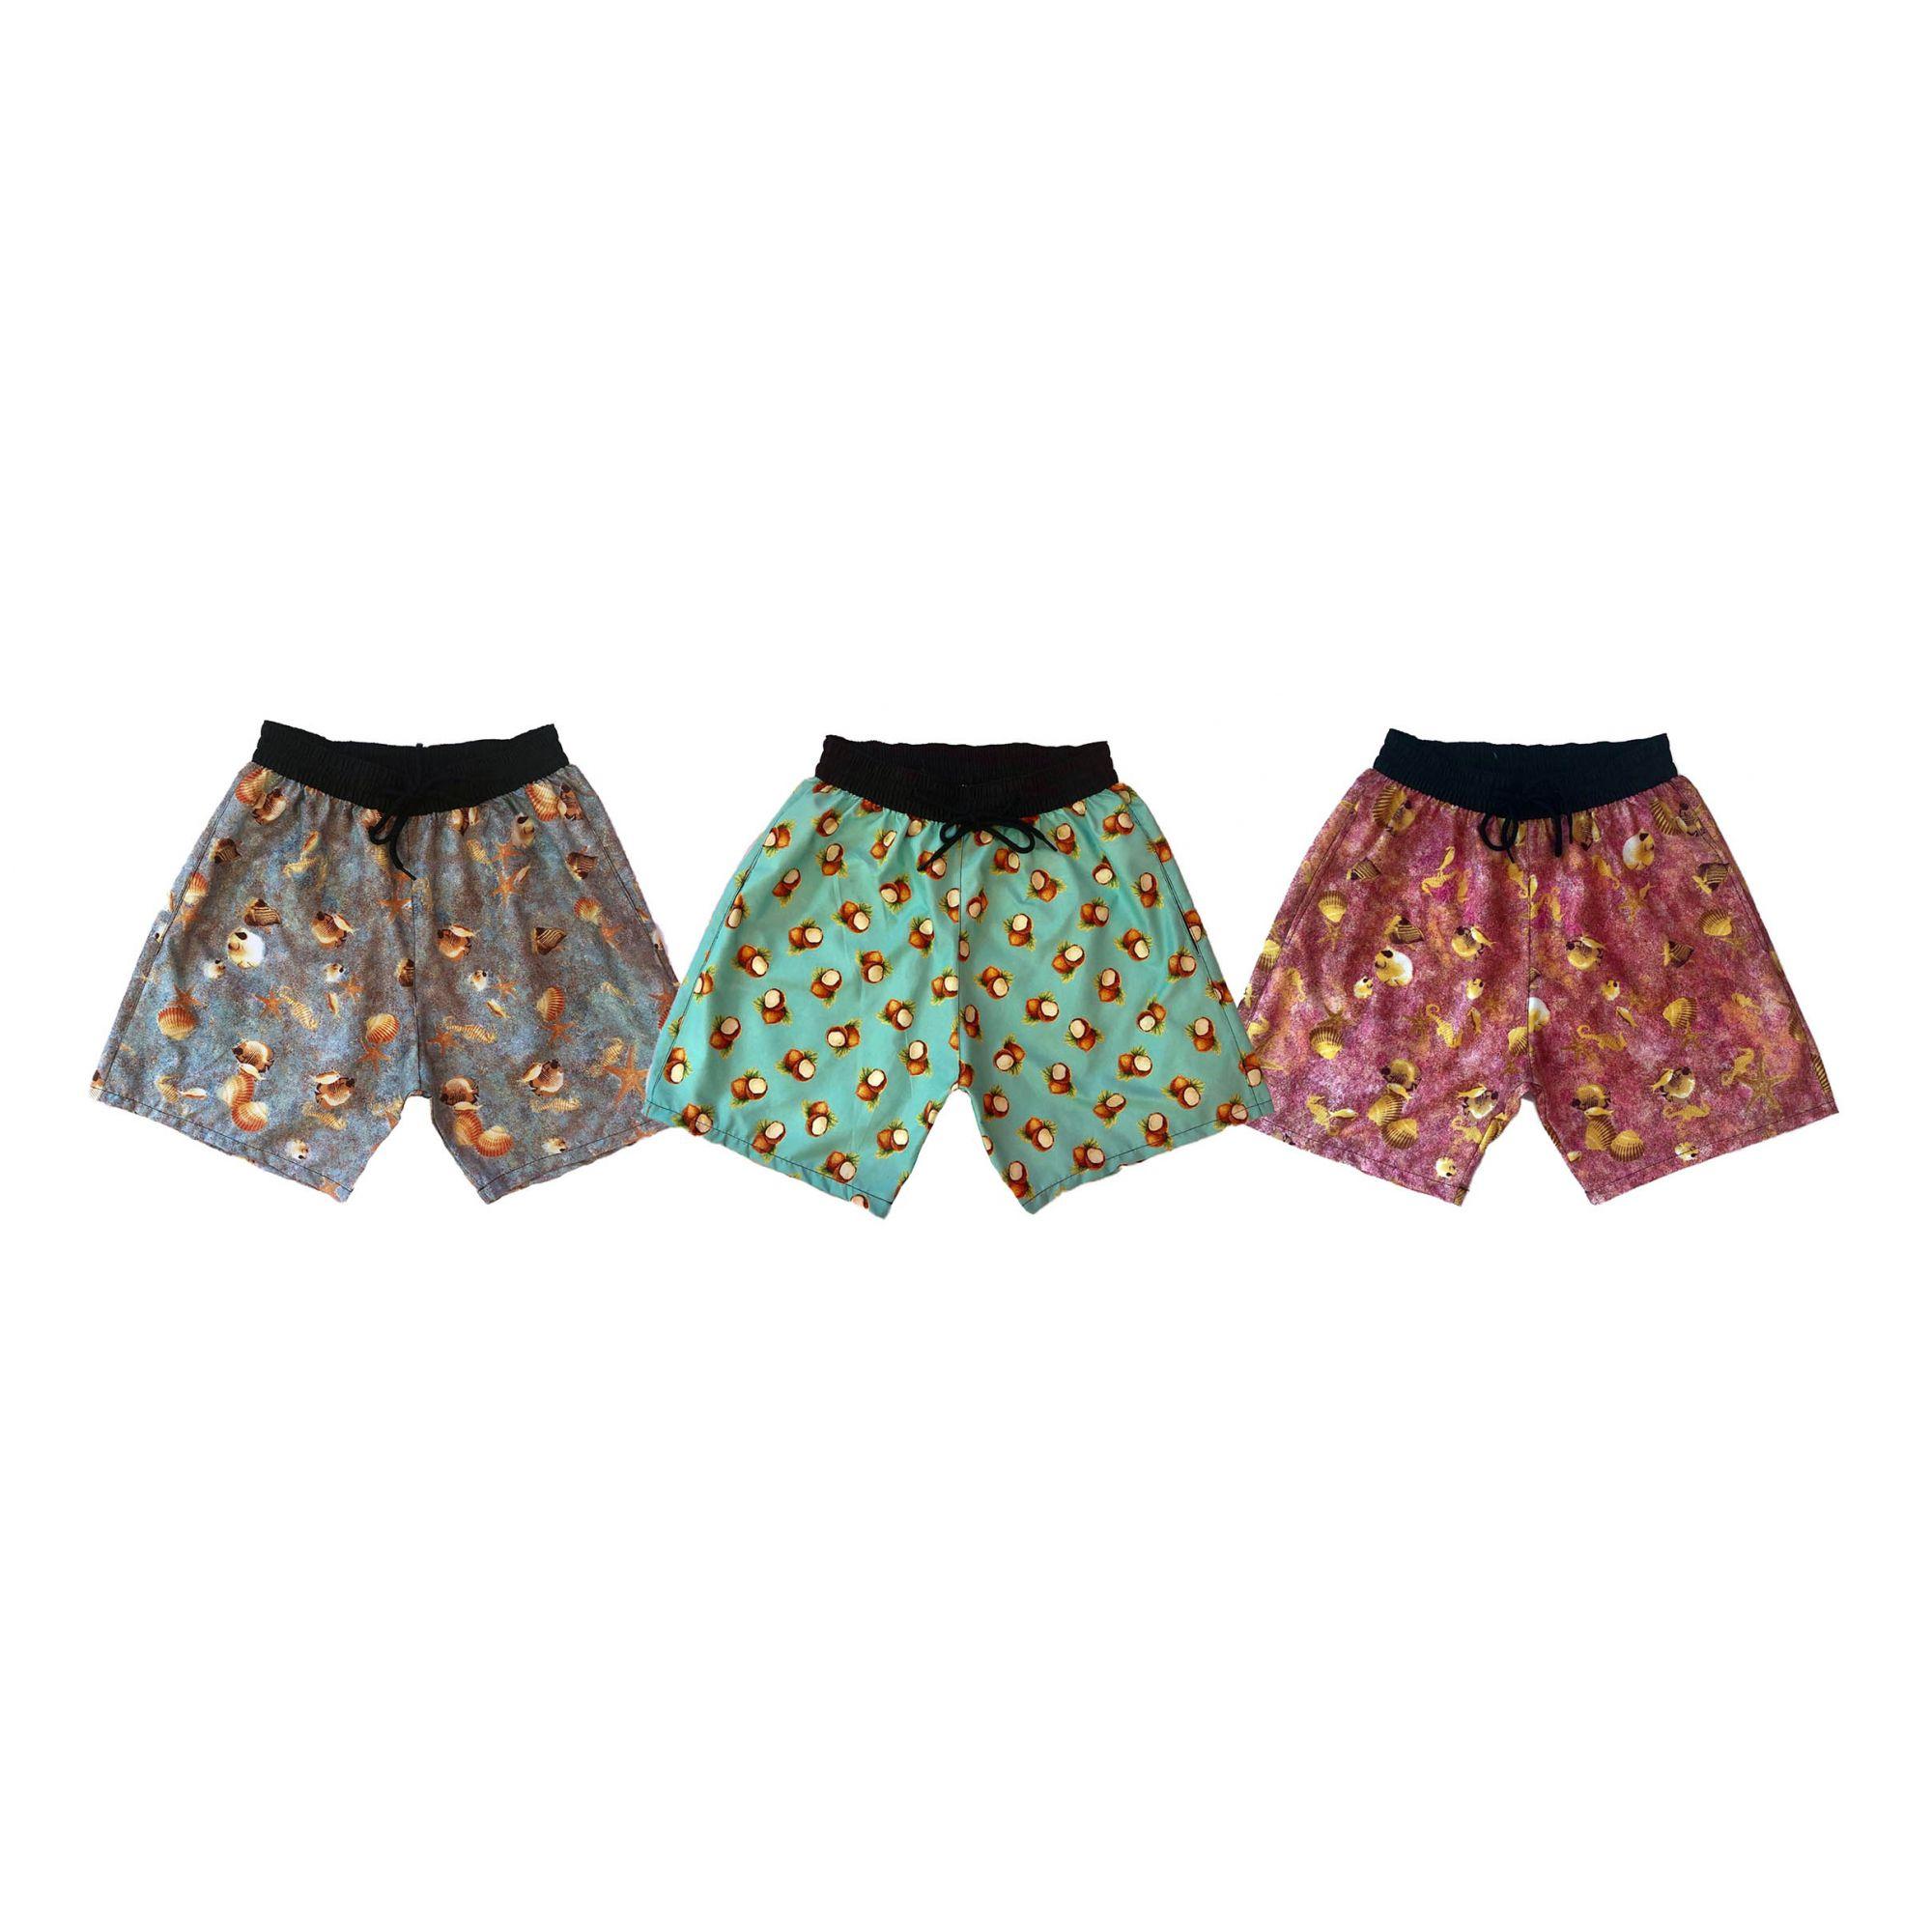 07793333d Kit 3 Shorts Praia Masculino Tactel Estampa Verão Ref.397.3 - Frent´s